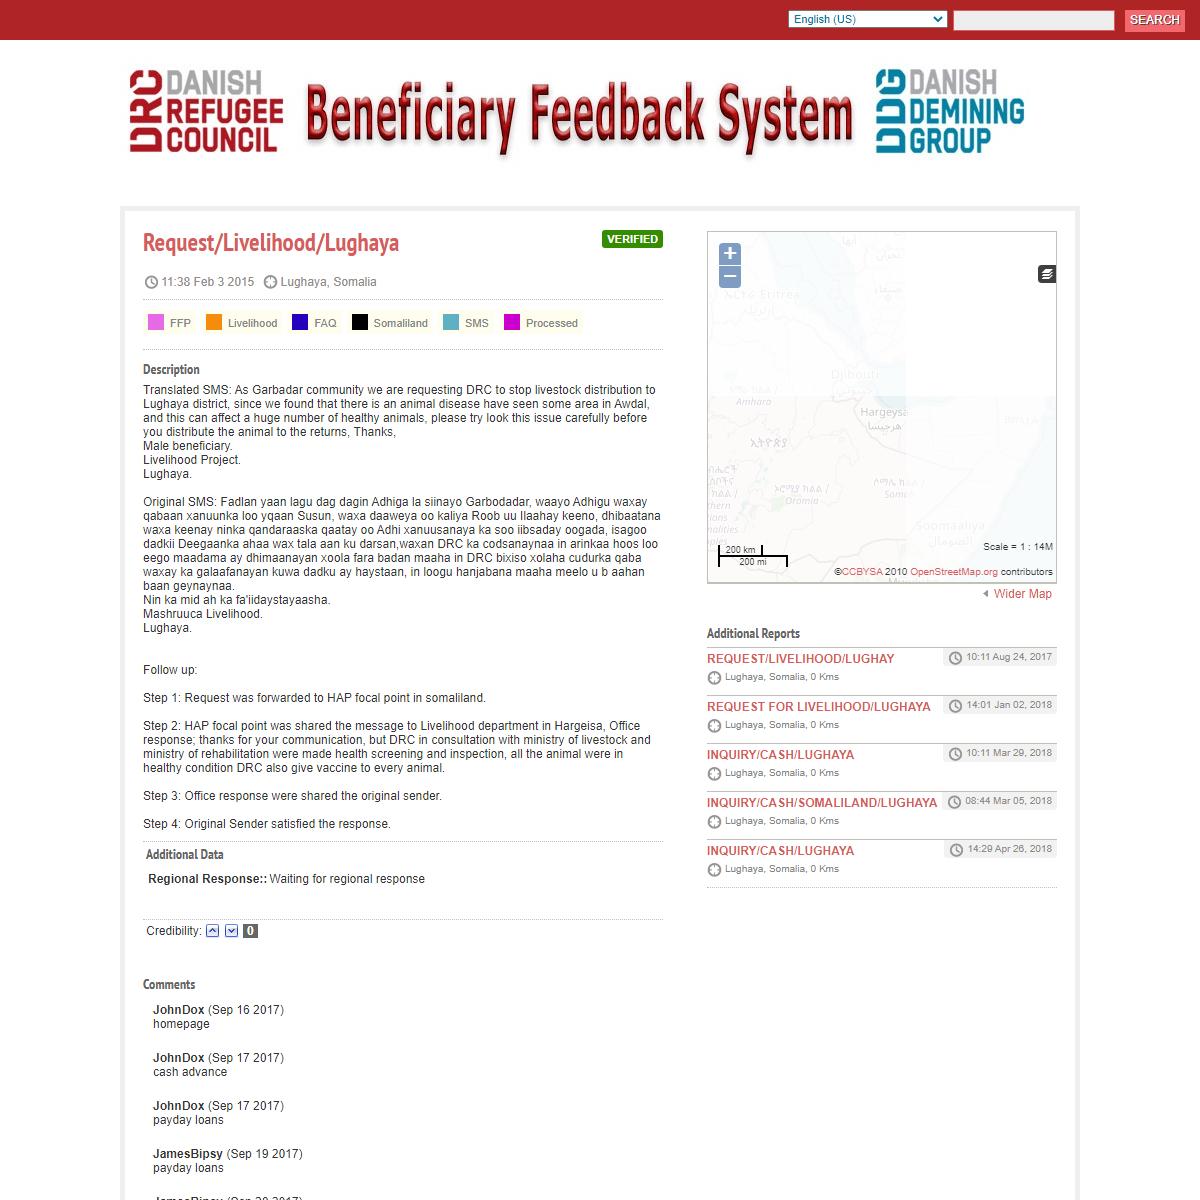 Request-Livelihood-Lughaya - Danish Refugee Council Beneficary Feedback System